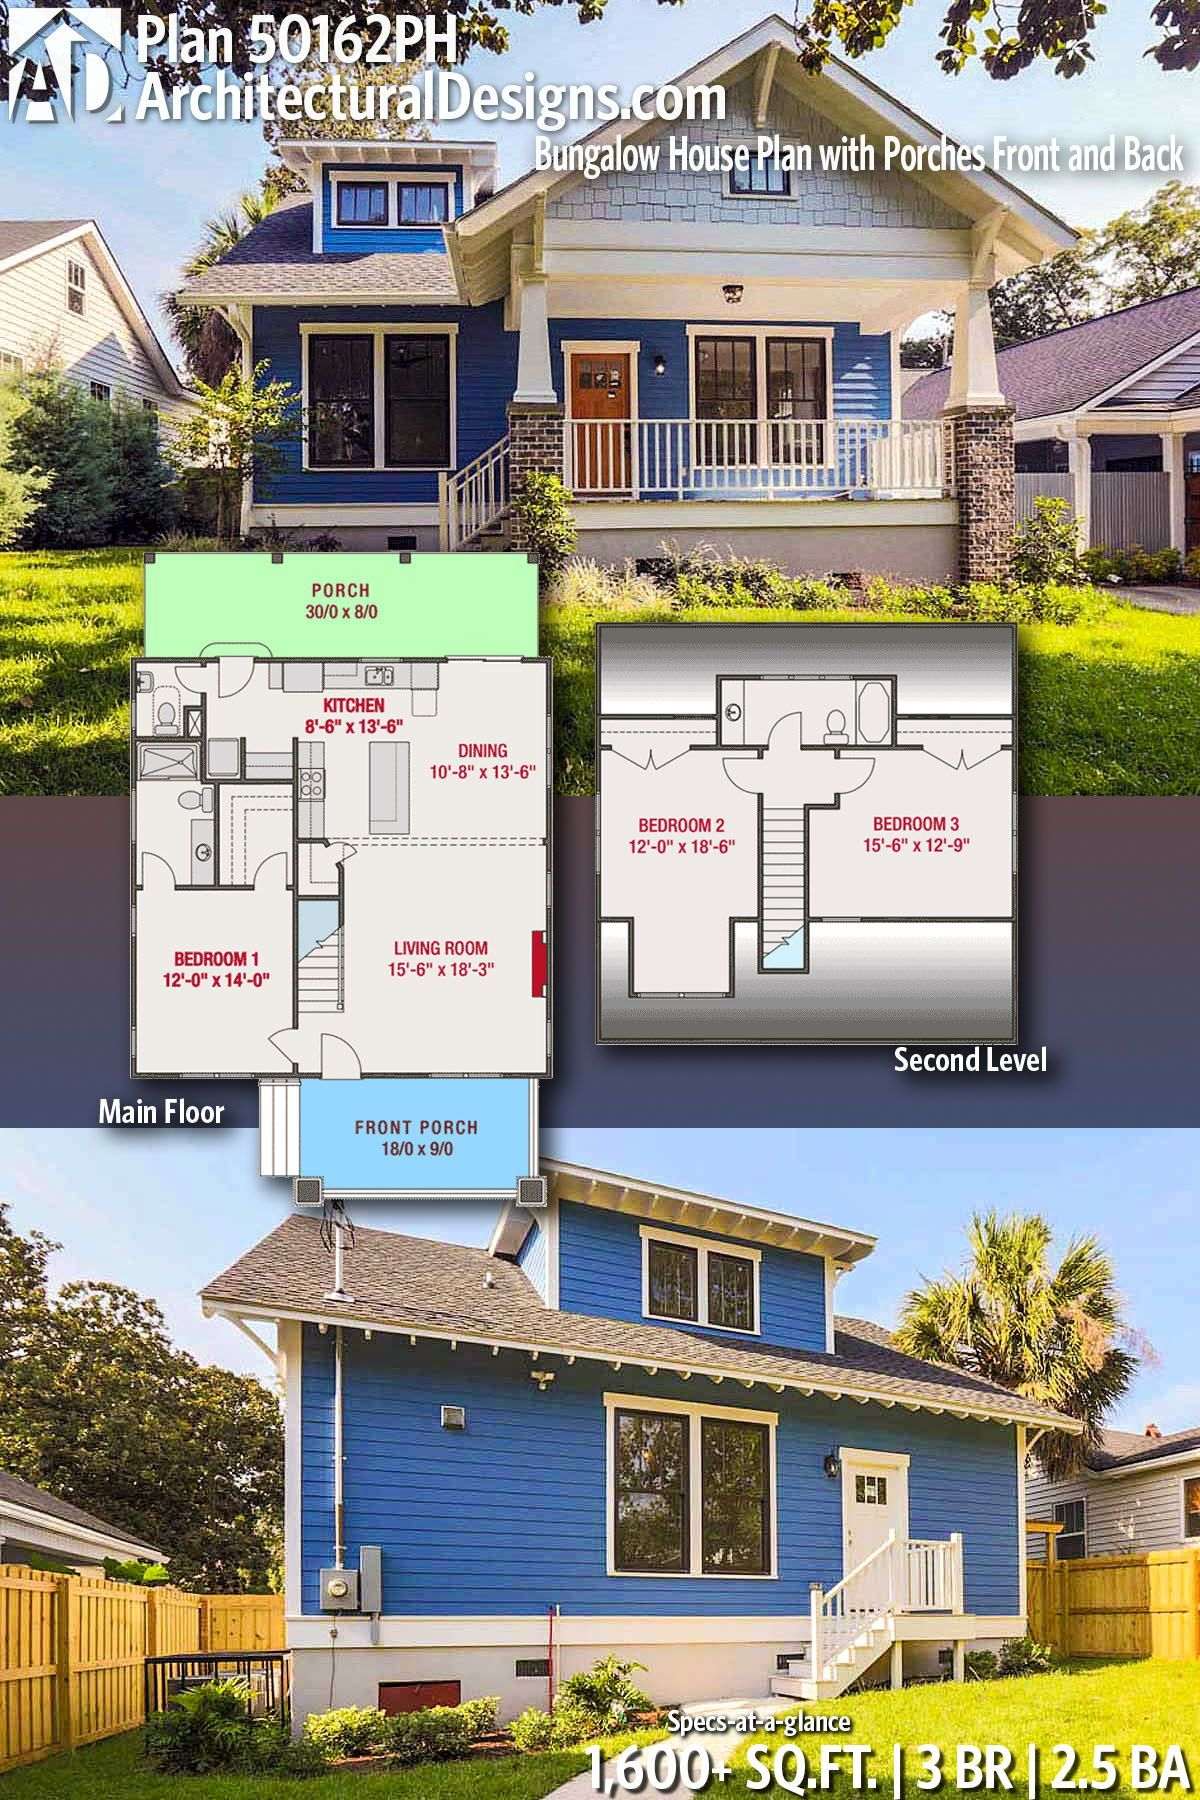 Plan 50162ph Bungalow House Plan With Porches Front And Back Bungalow House Plans Bungalow Floor Plans Porch House Plans